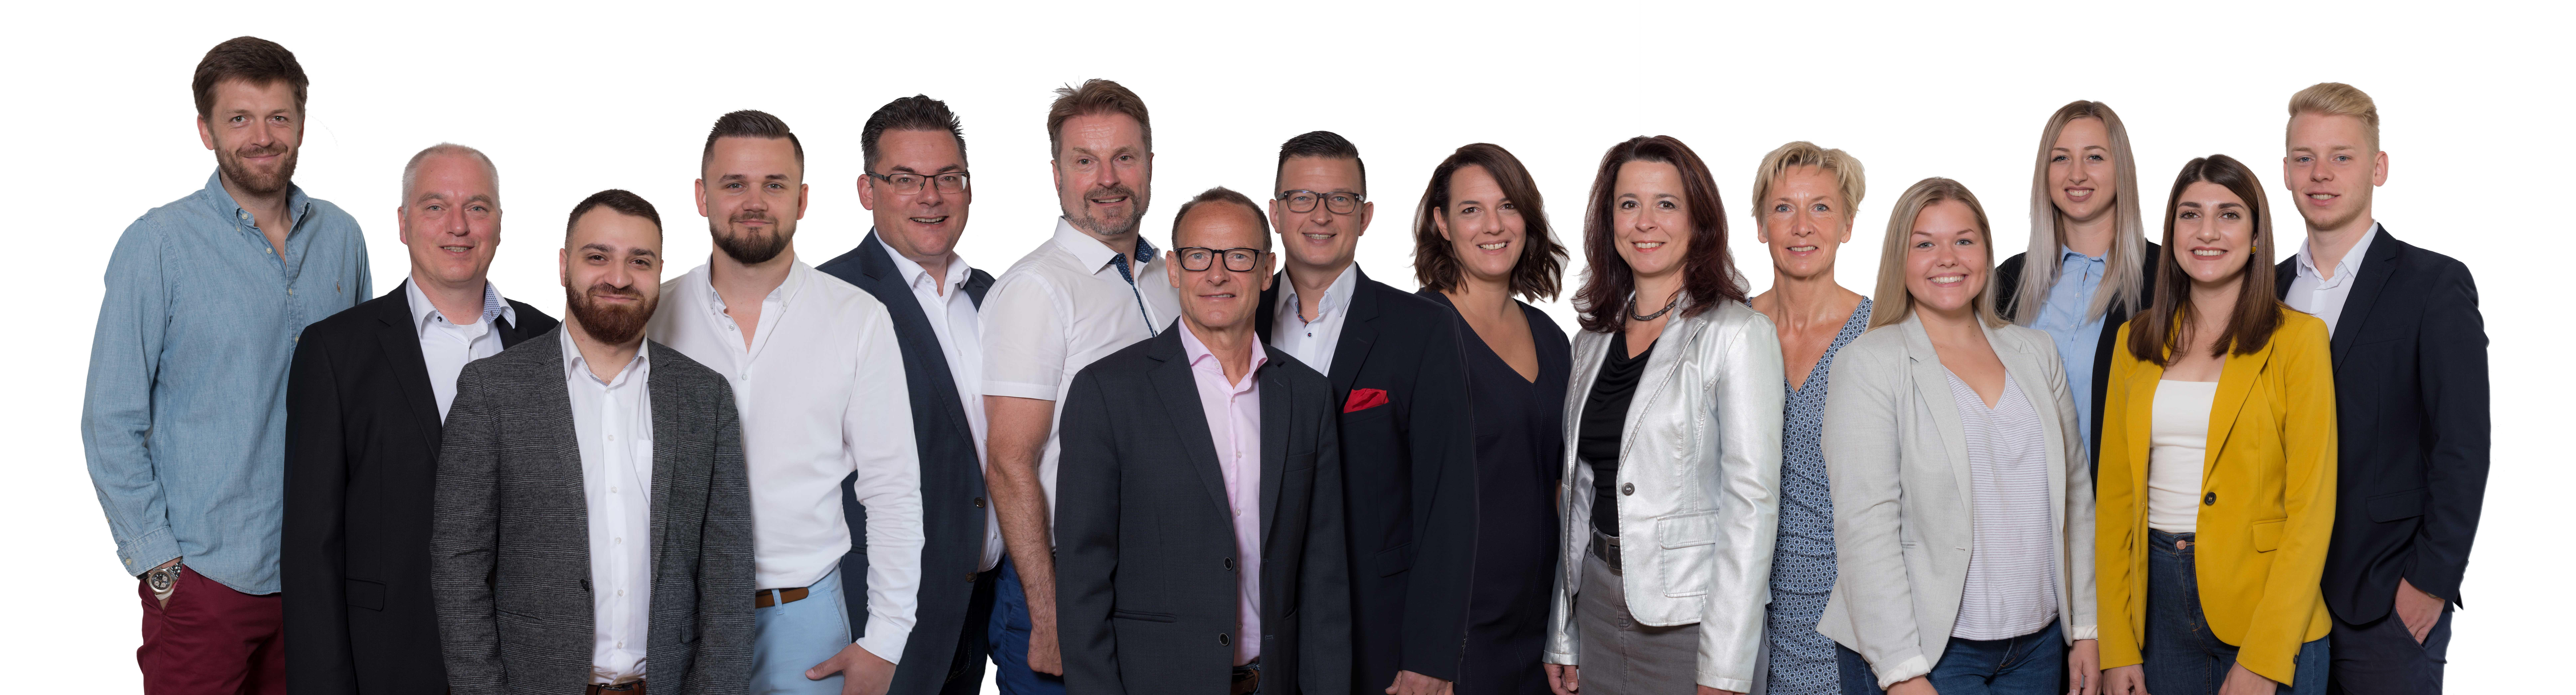 AXA Bremen fair Finanzpartner oHG Team